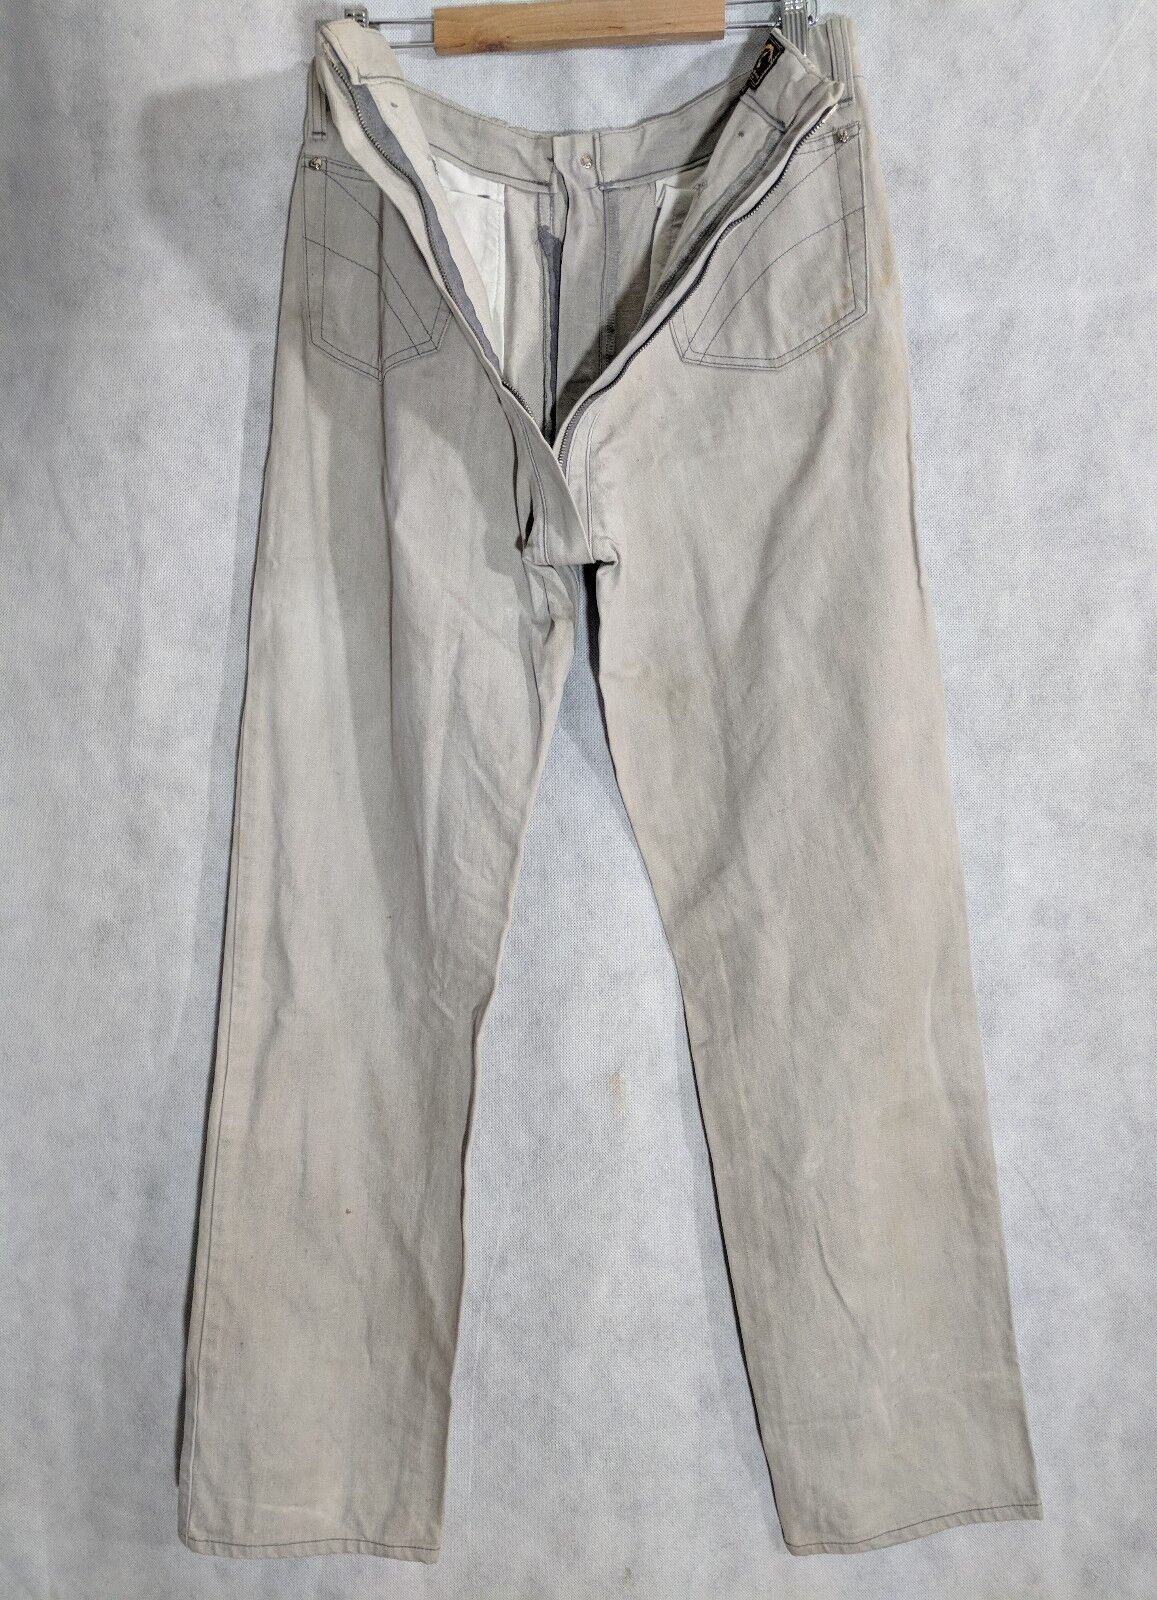 Vivienne Westwood MAN Anglomania Archive Vintage … - image 3